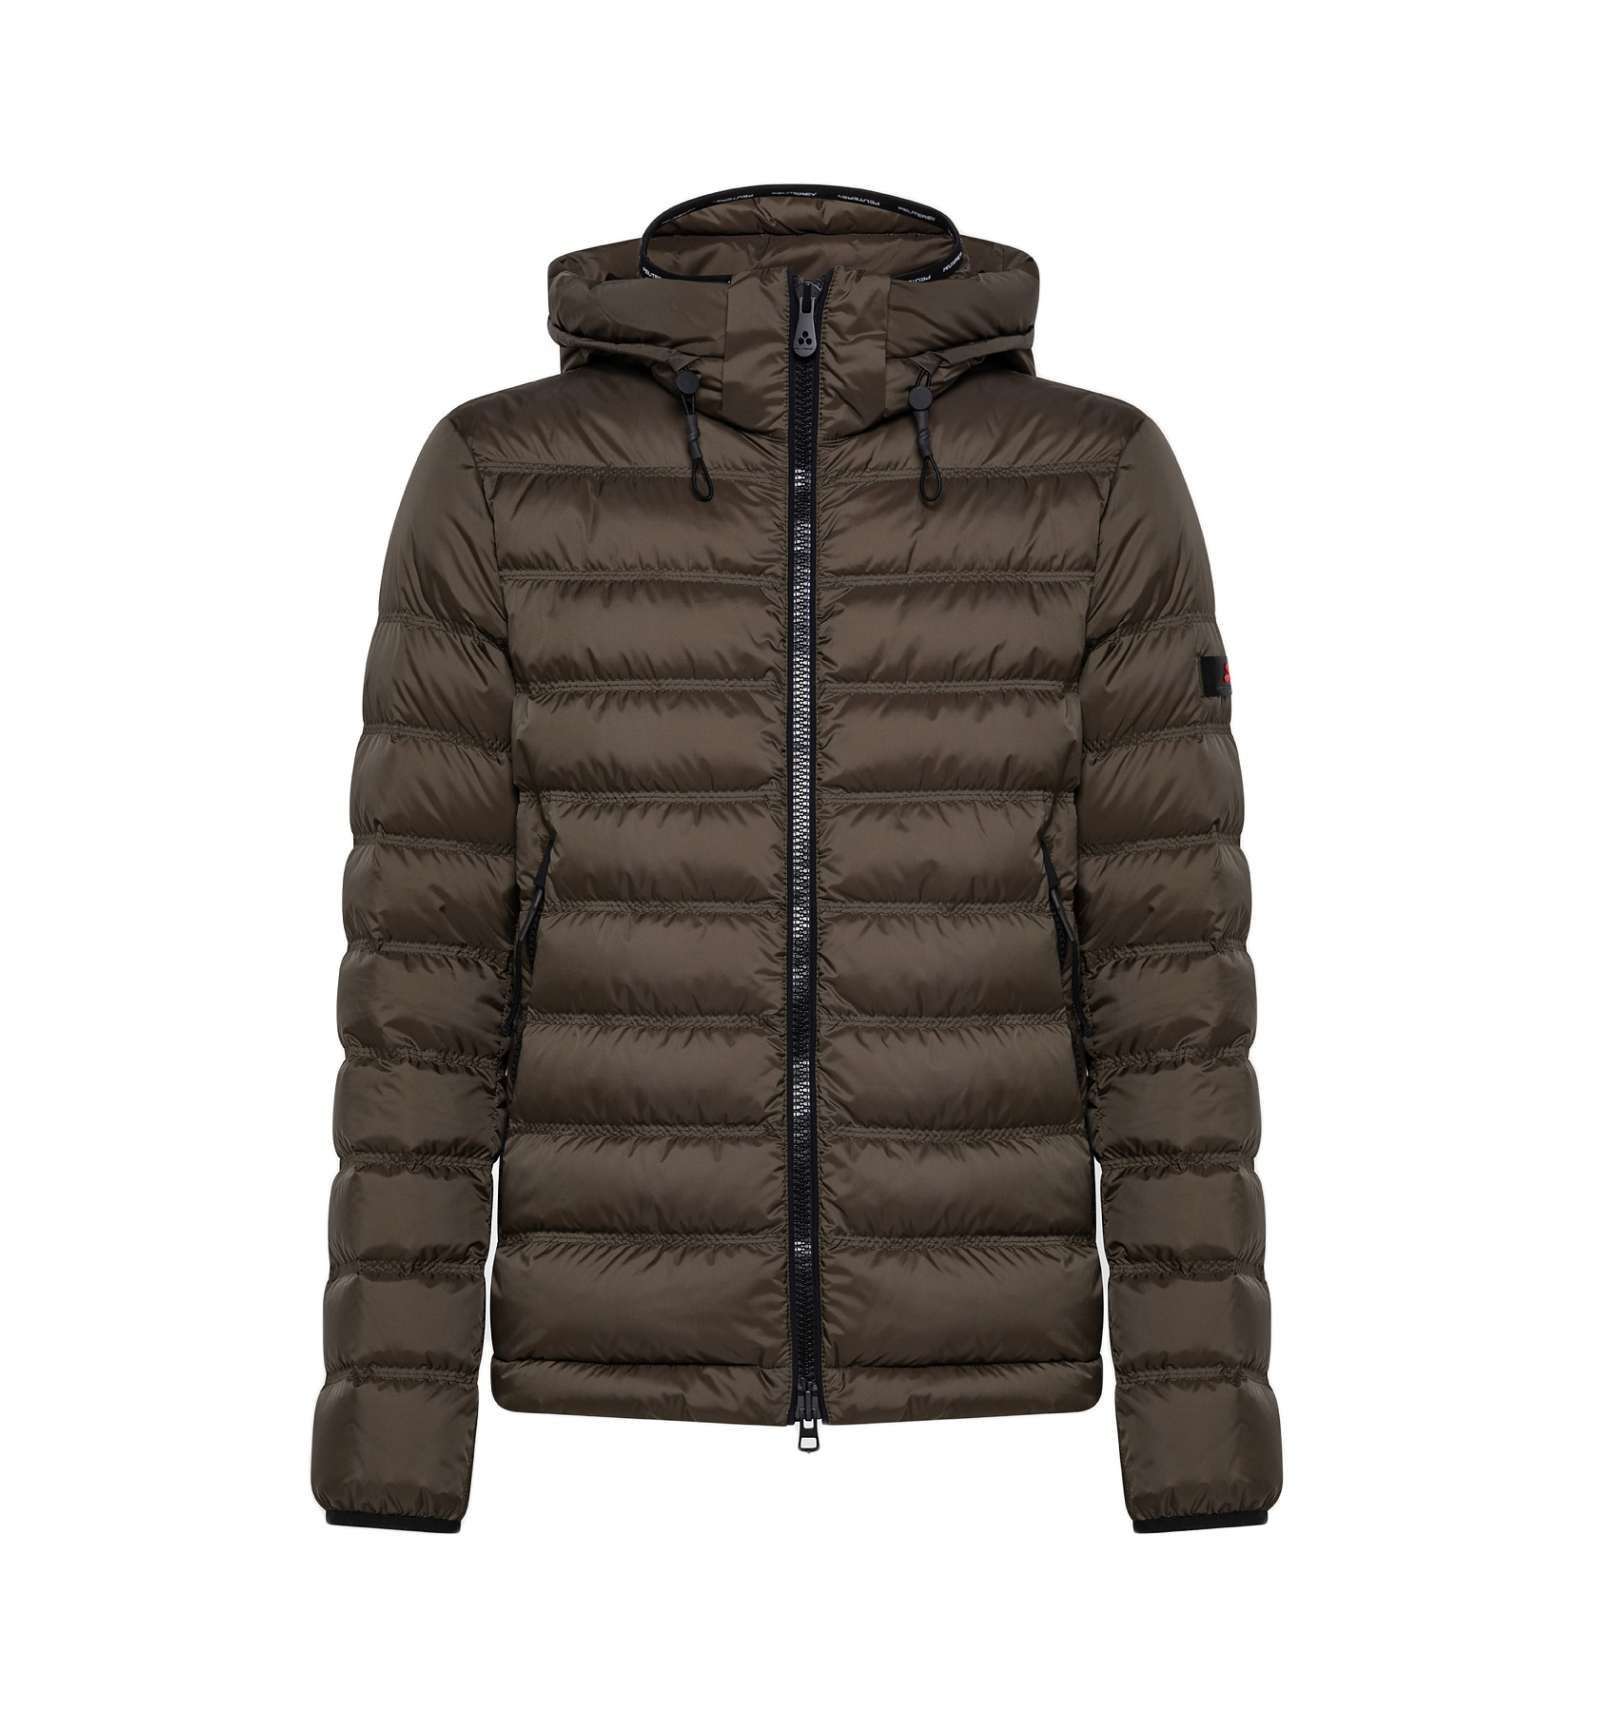 DESIDERIO boutique PEUTEREY uomo BOGGS KN 690 piumino giacca